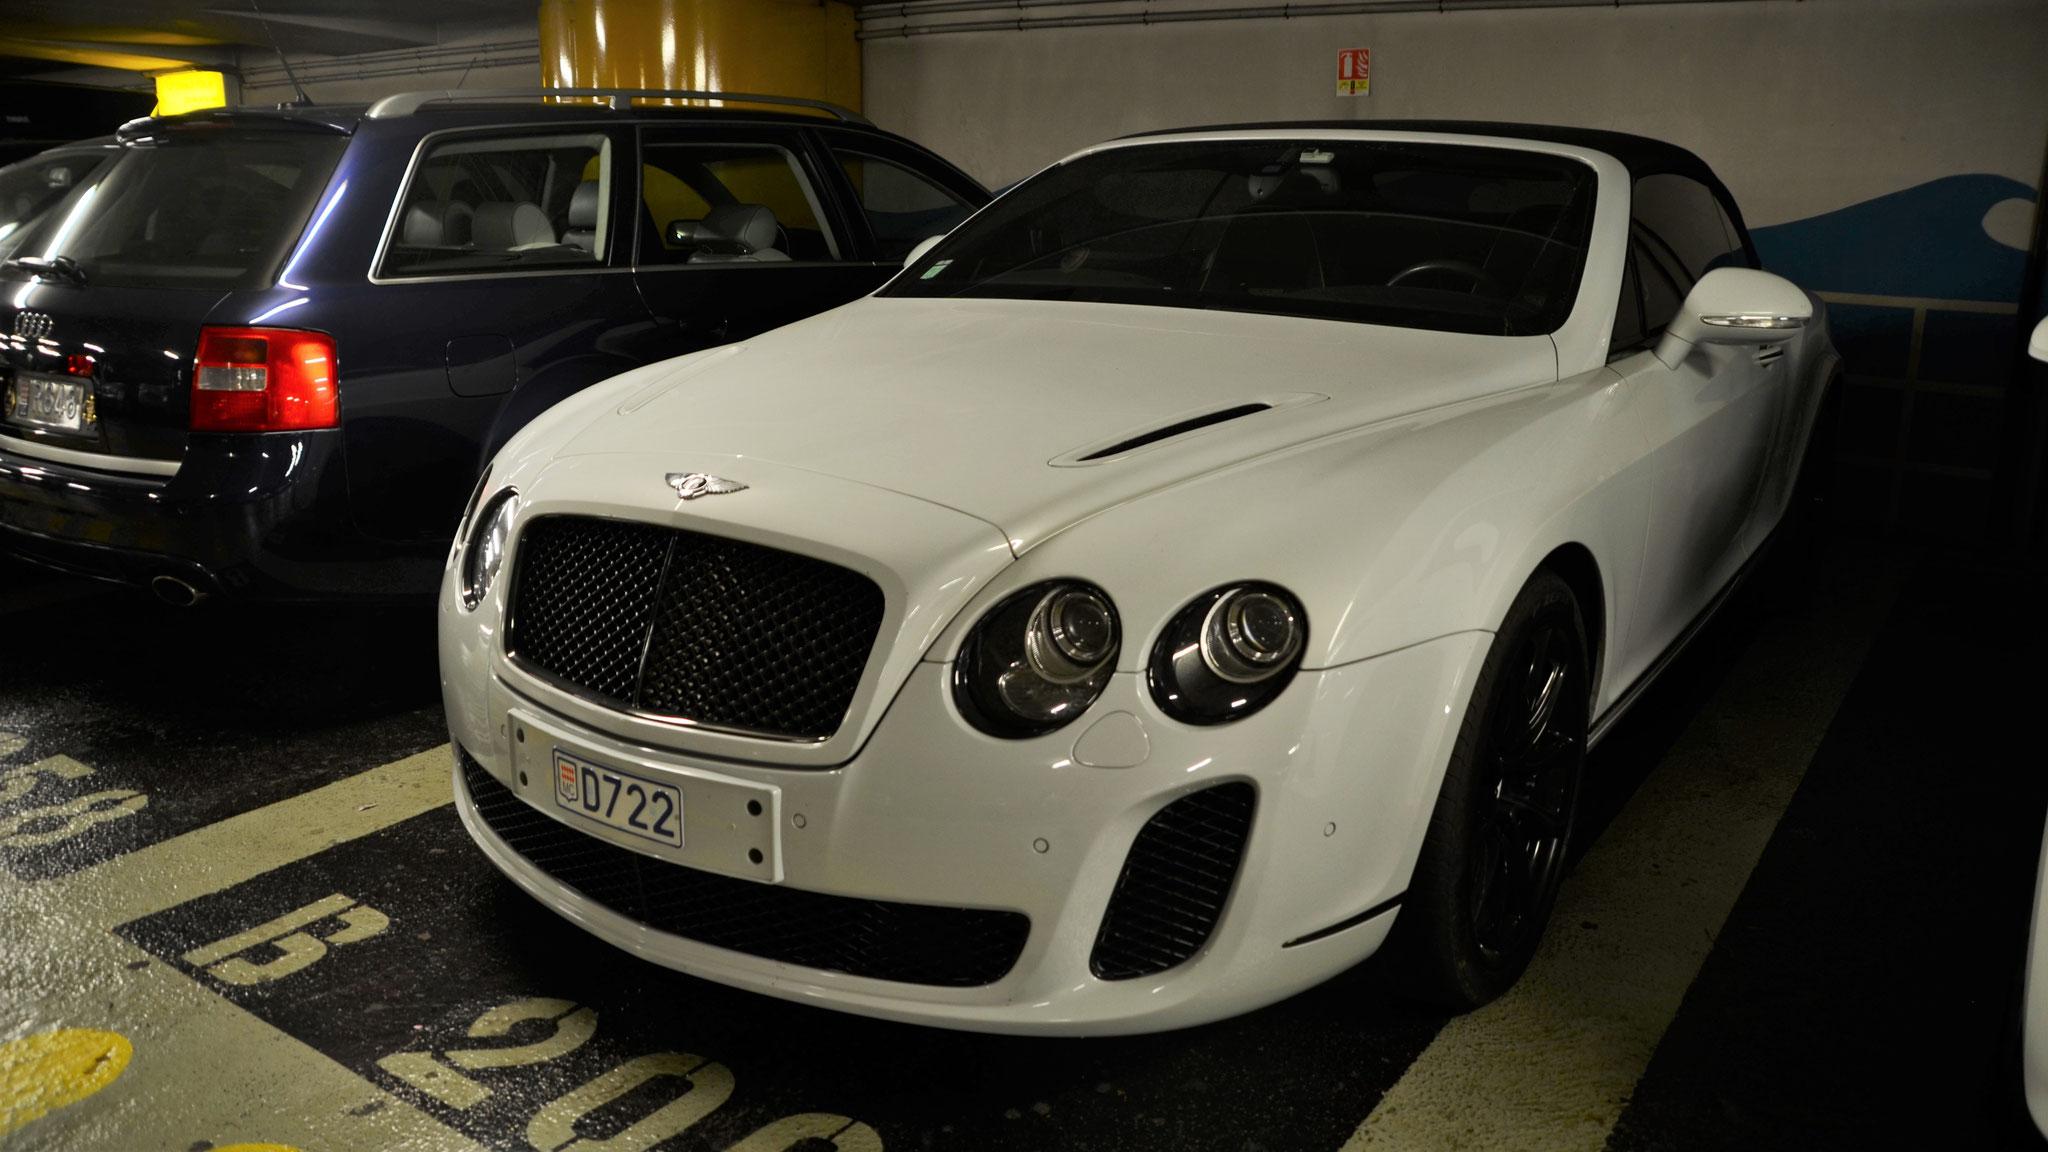 Bentley Continental GTC Supersports - D722 (MC)